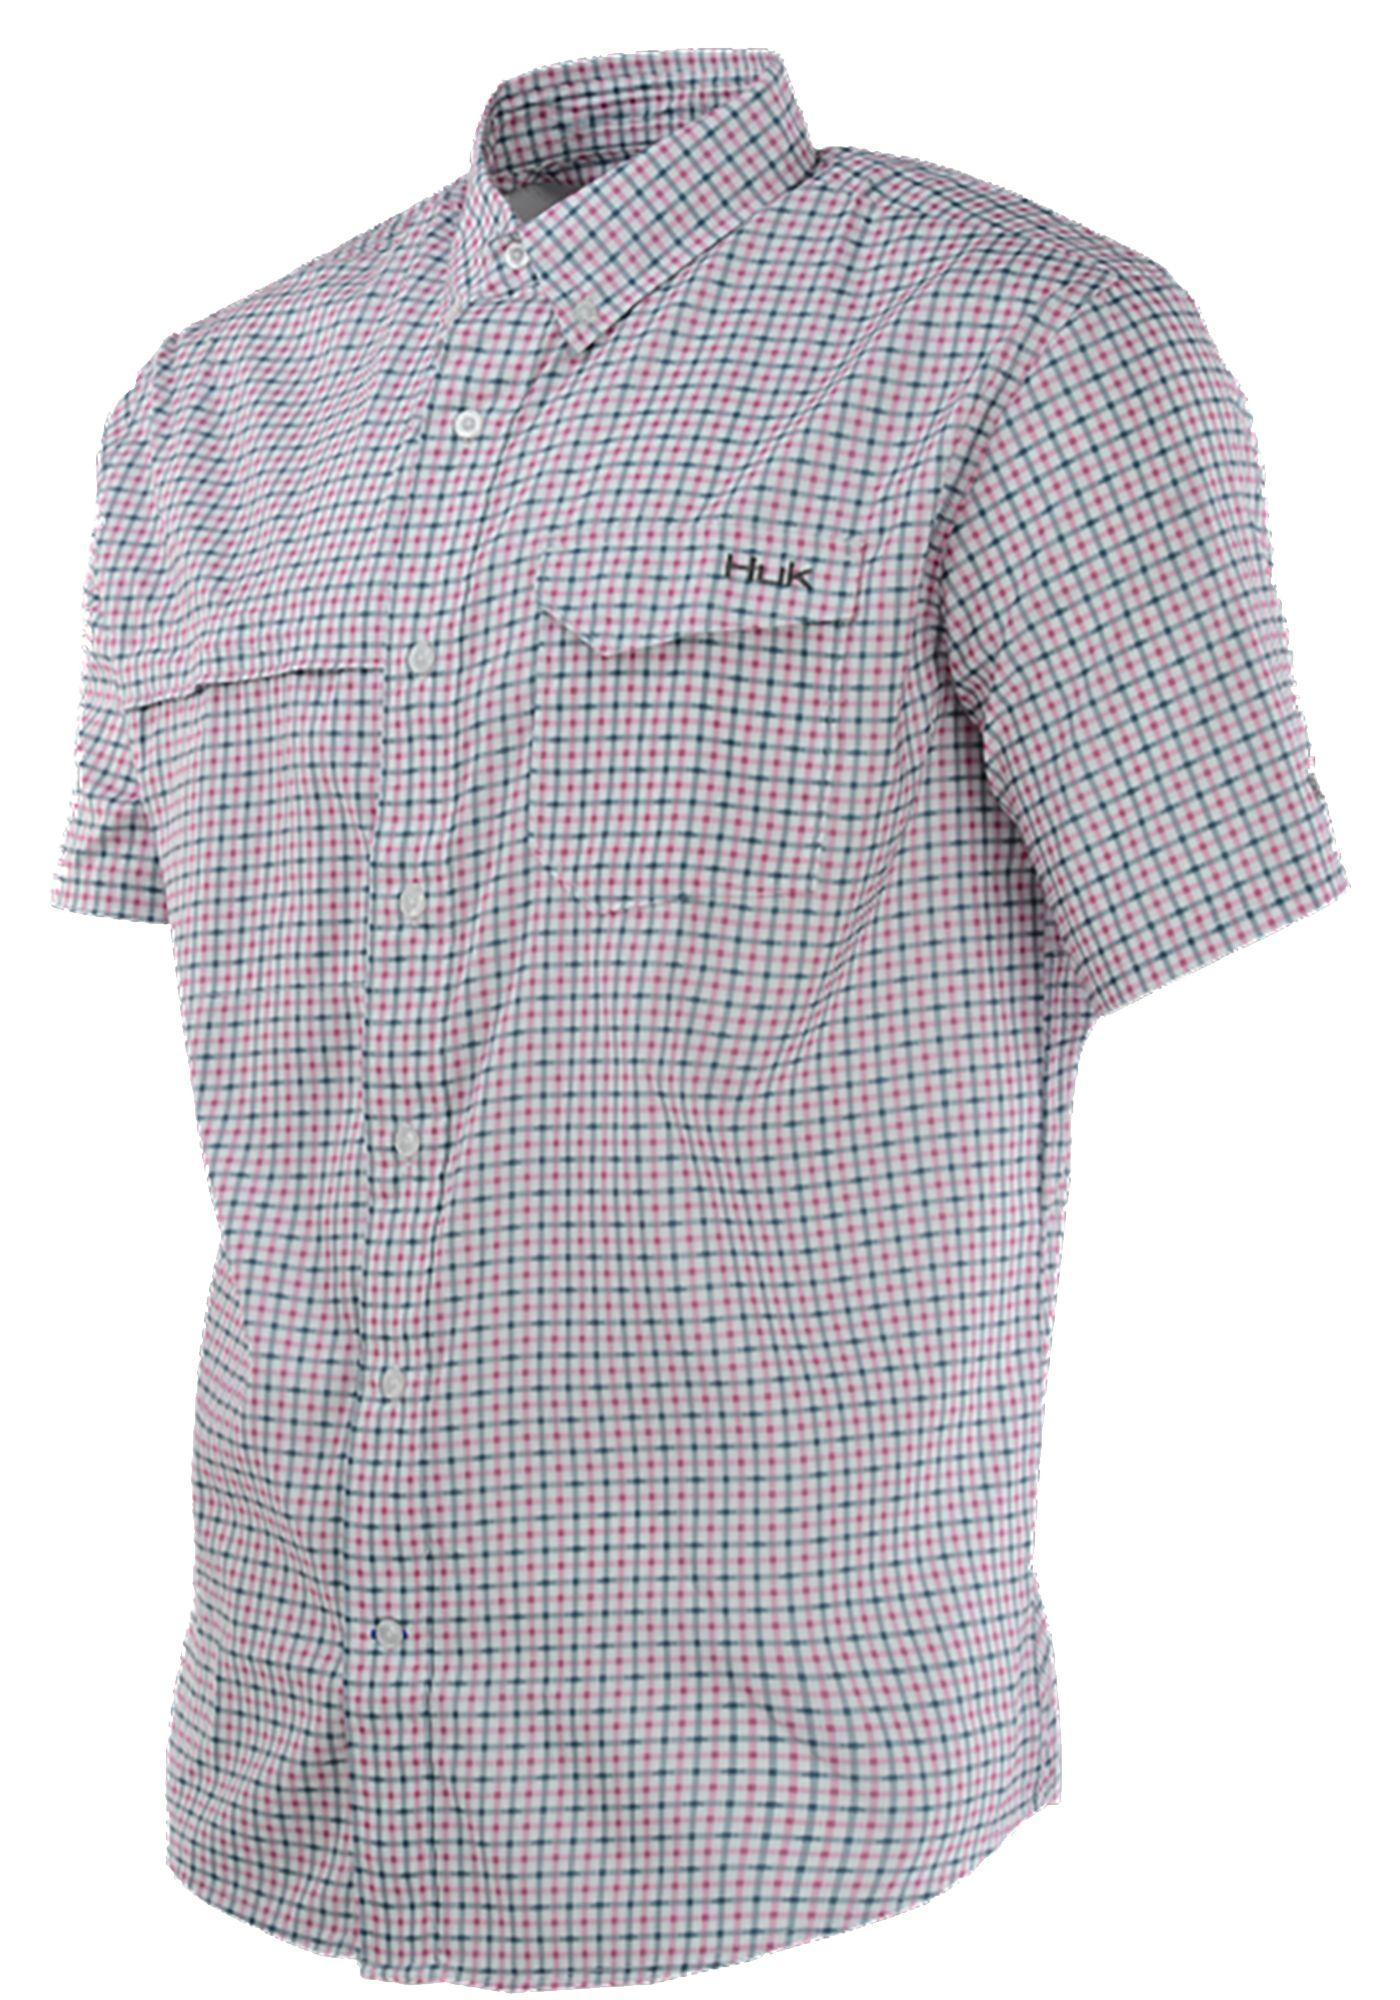 HUK Men's Tide Point Woven Plaid Button Down Short Sleeve Shirt